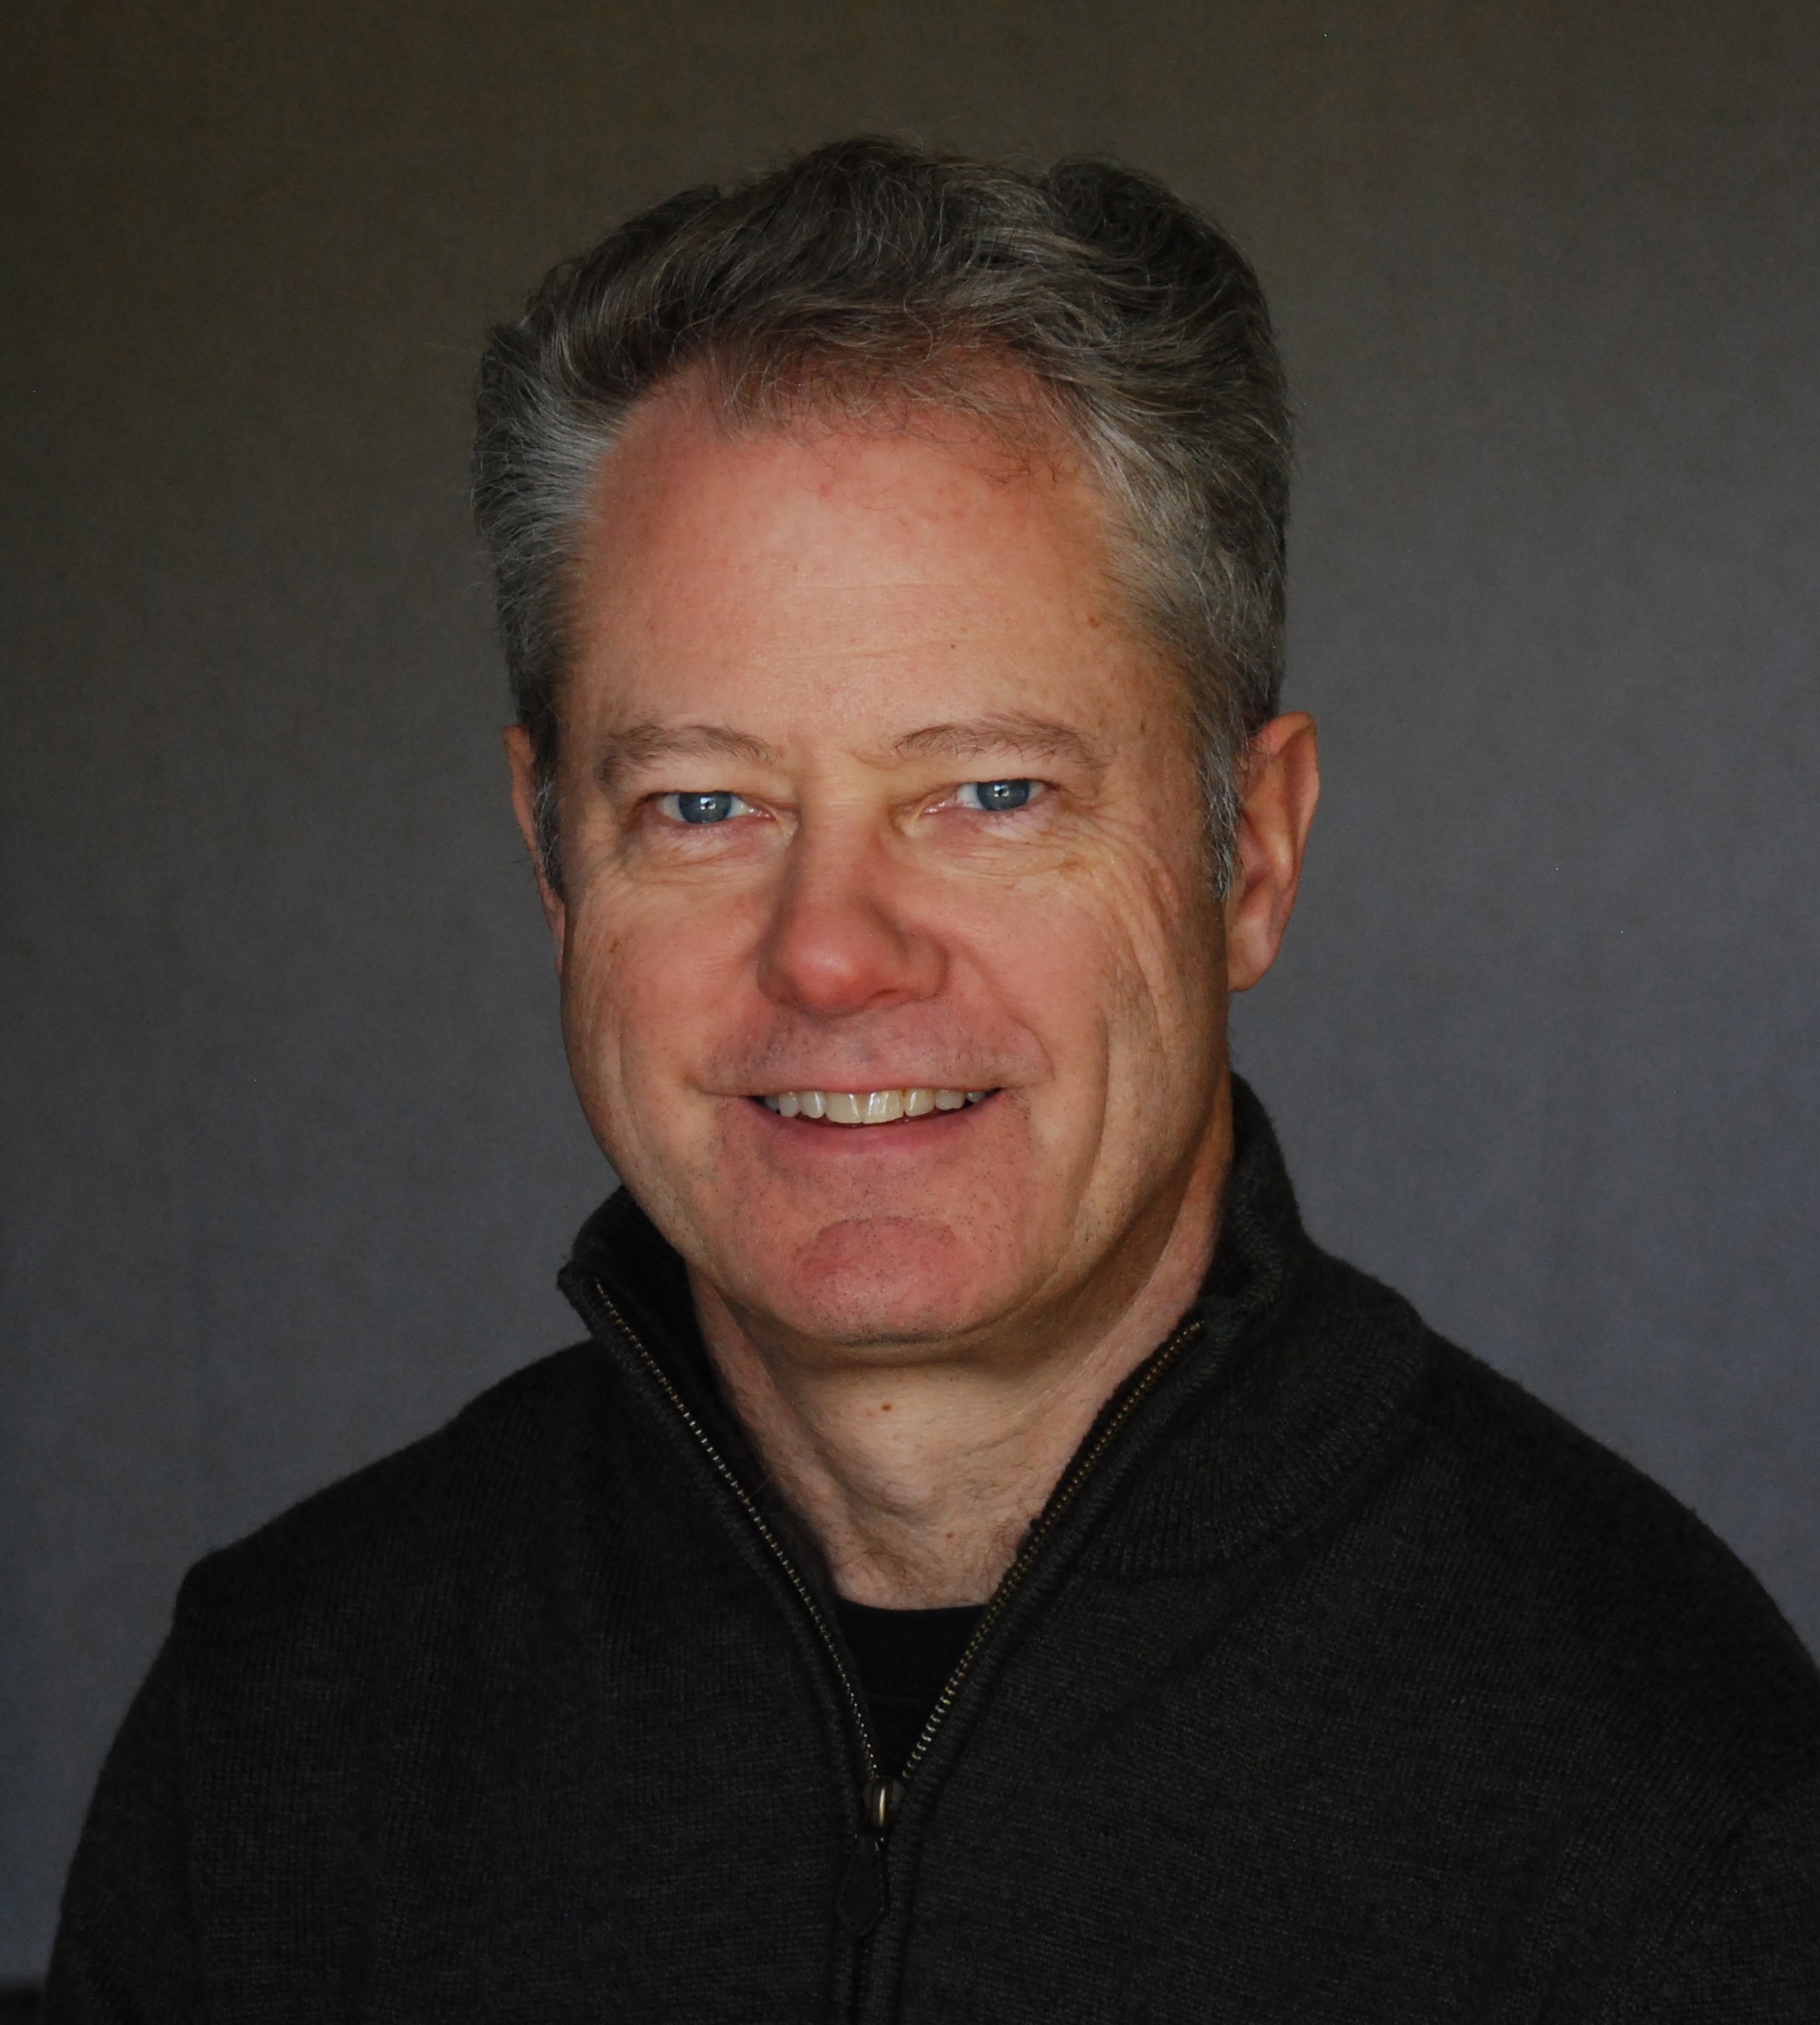 PatrickKelly Author Headshot.jpg